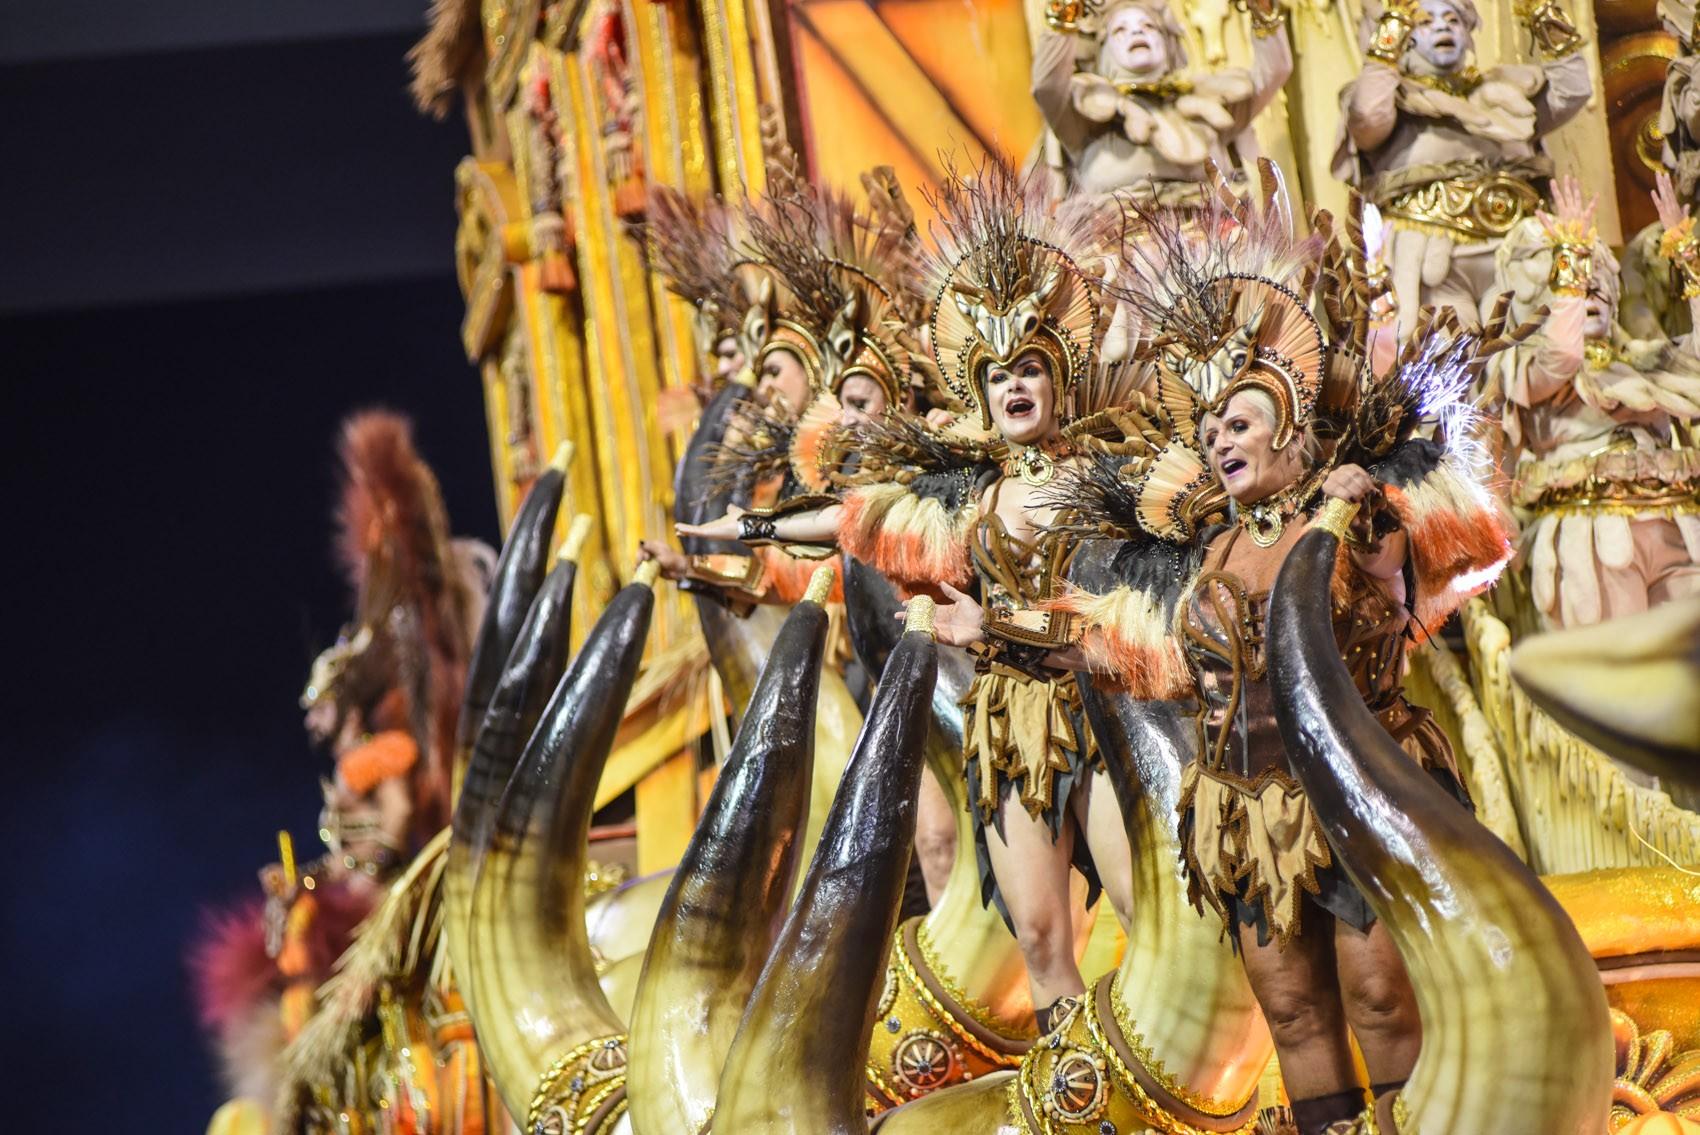 Inspirada no clássico 'Asa Branca', Dragões faz desfile vibrante sobre o Nordeste